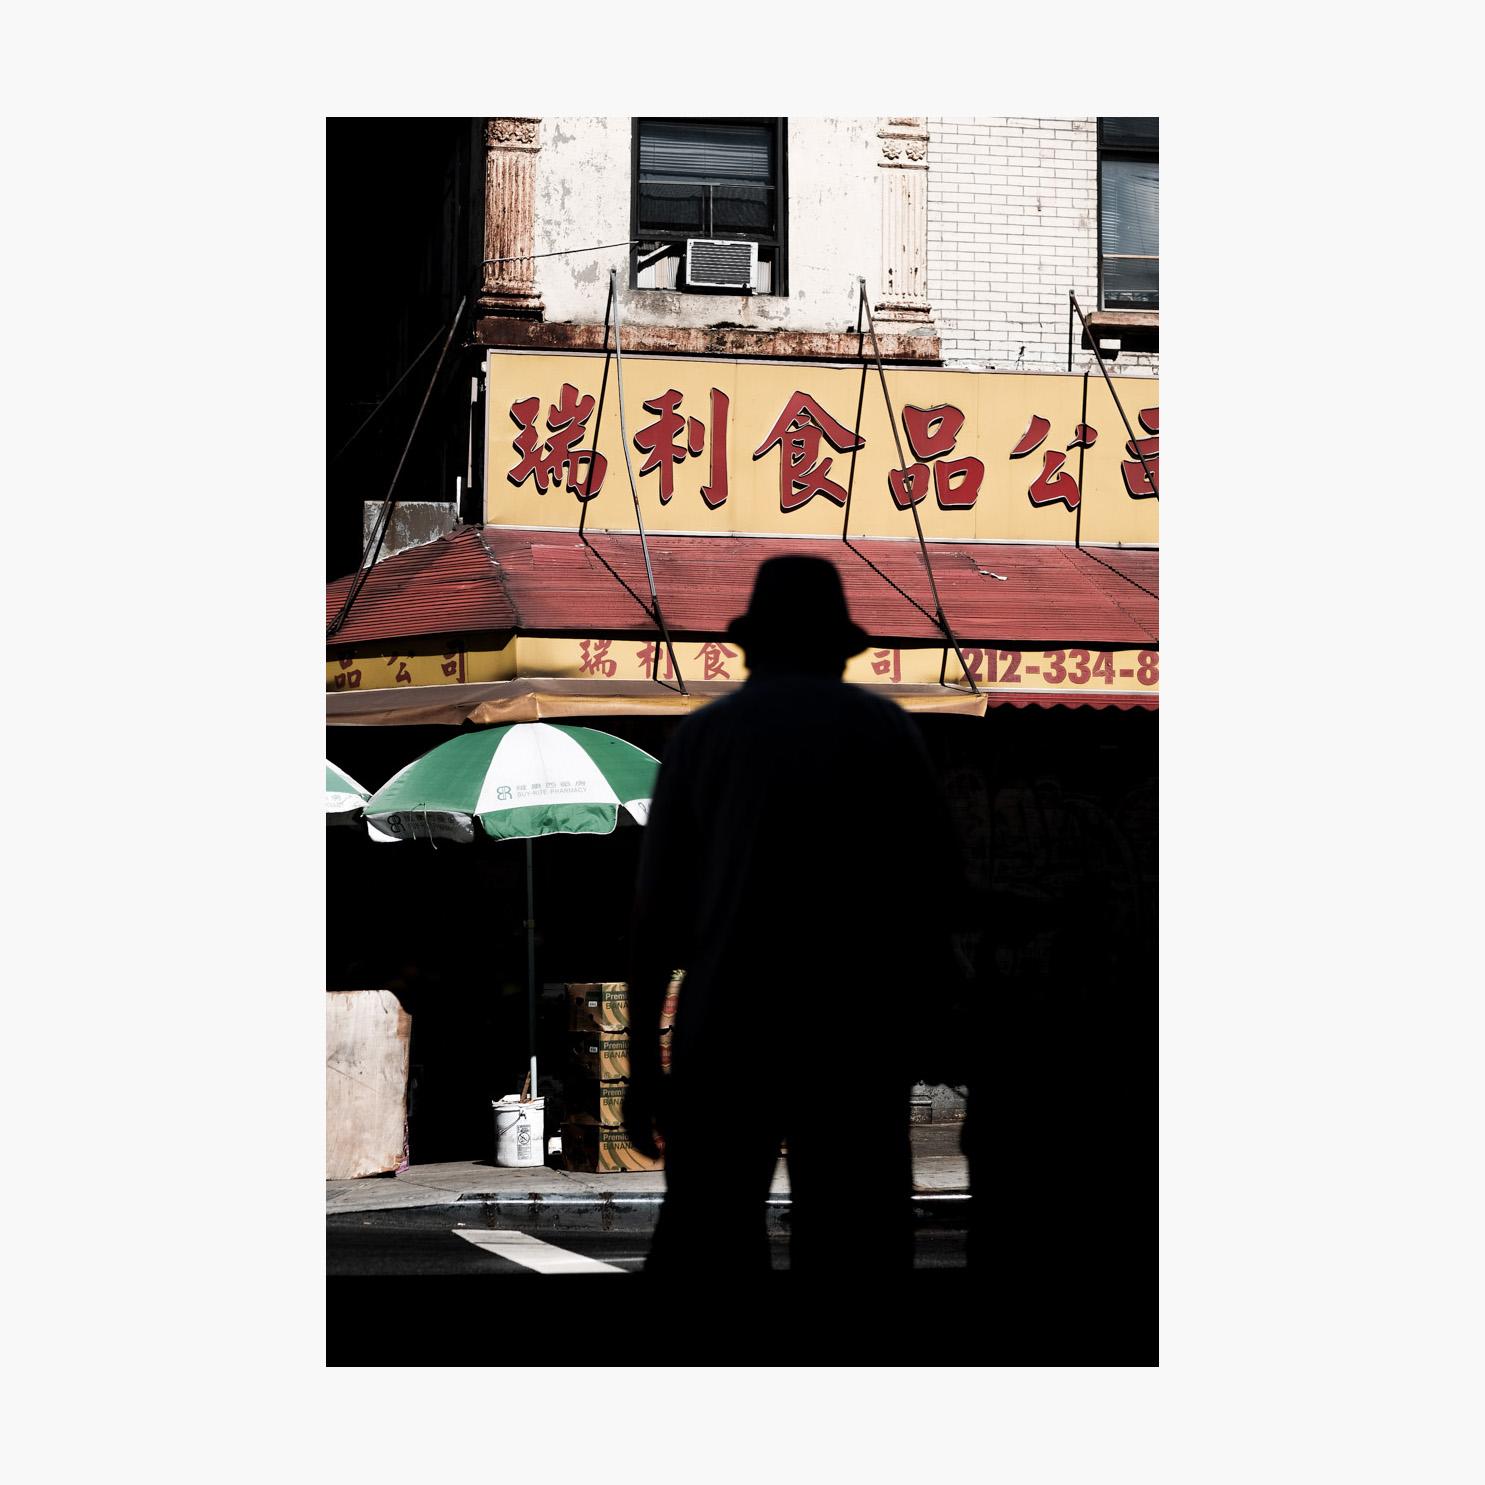 ©-2018-Harry-W-Edmonds-London-Photographer-Missing-the-Shot-PN08.jpg